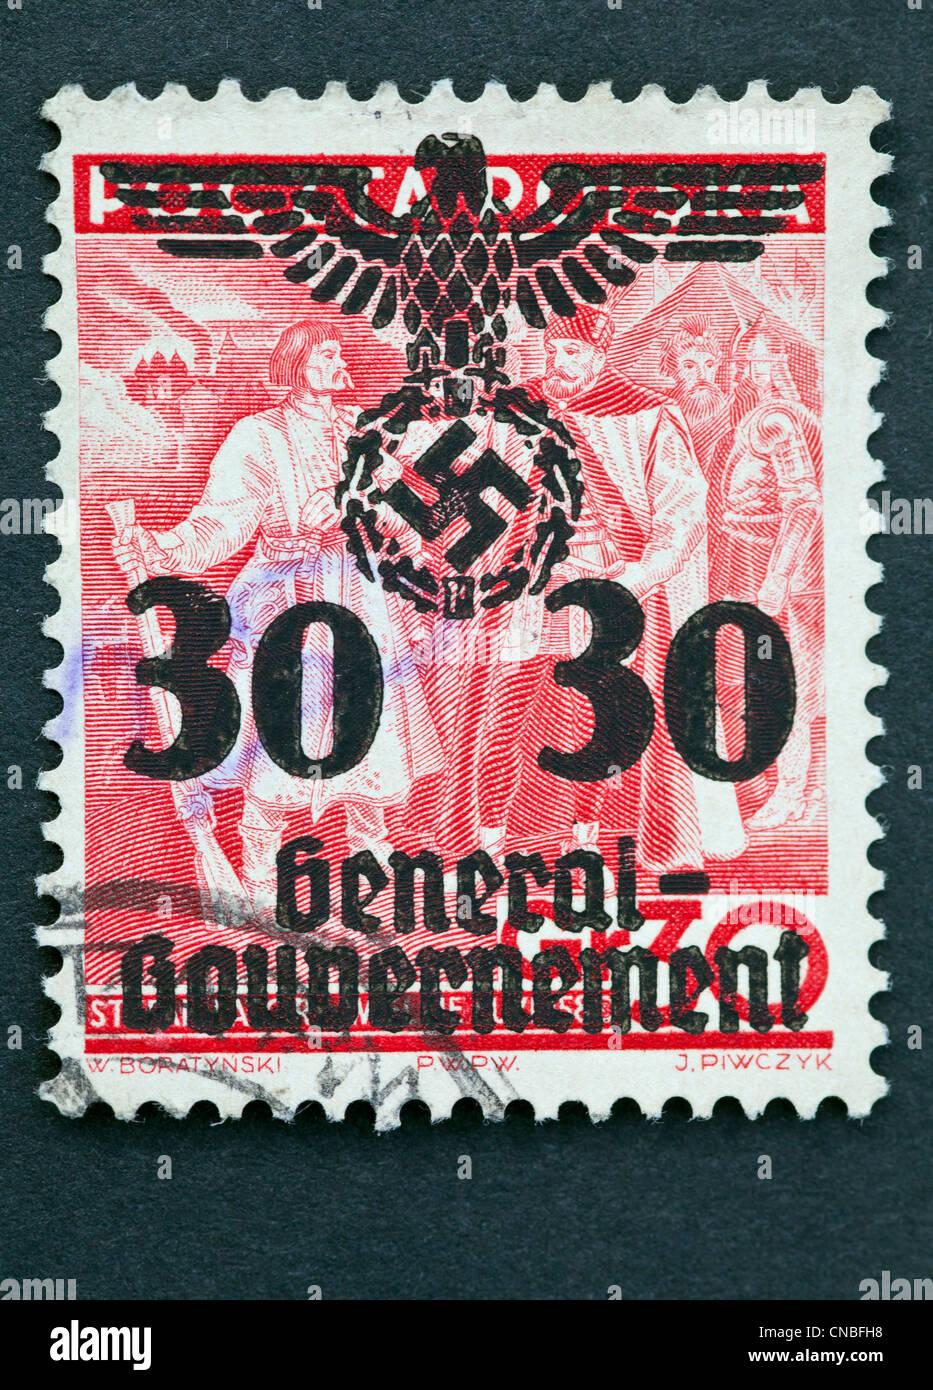 Polish stamp with Nazi overprint - Stock Image